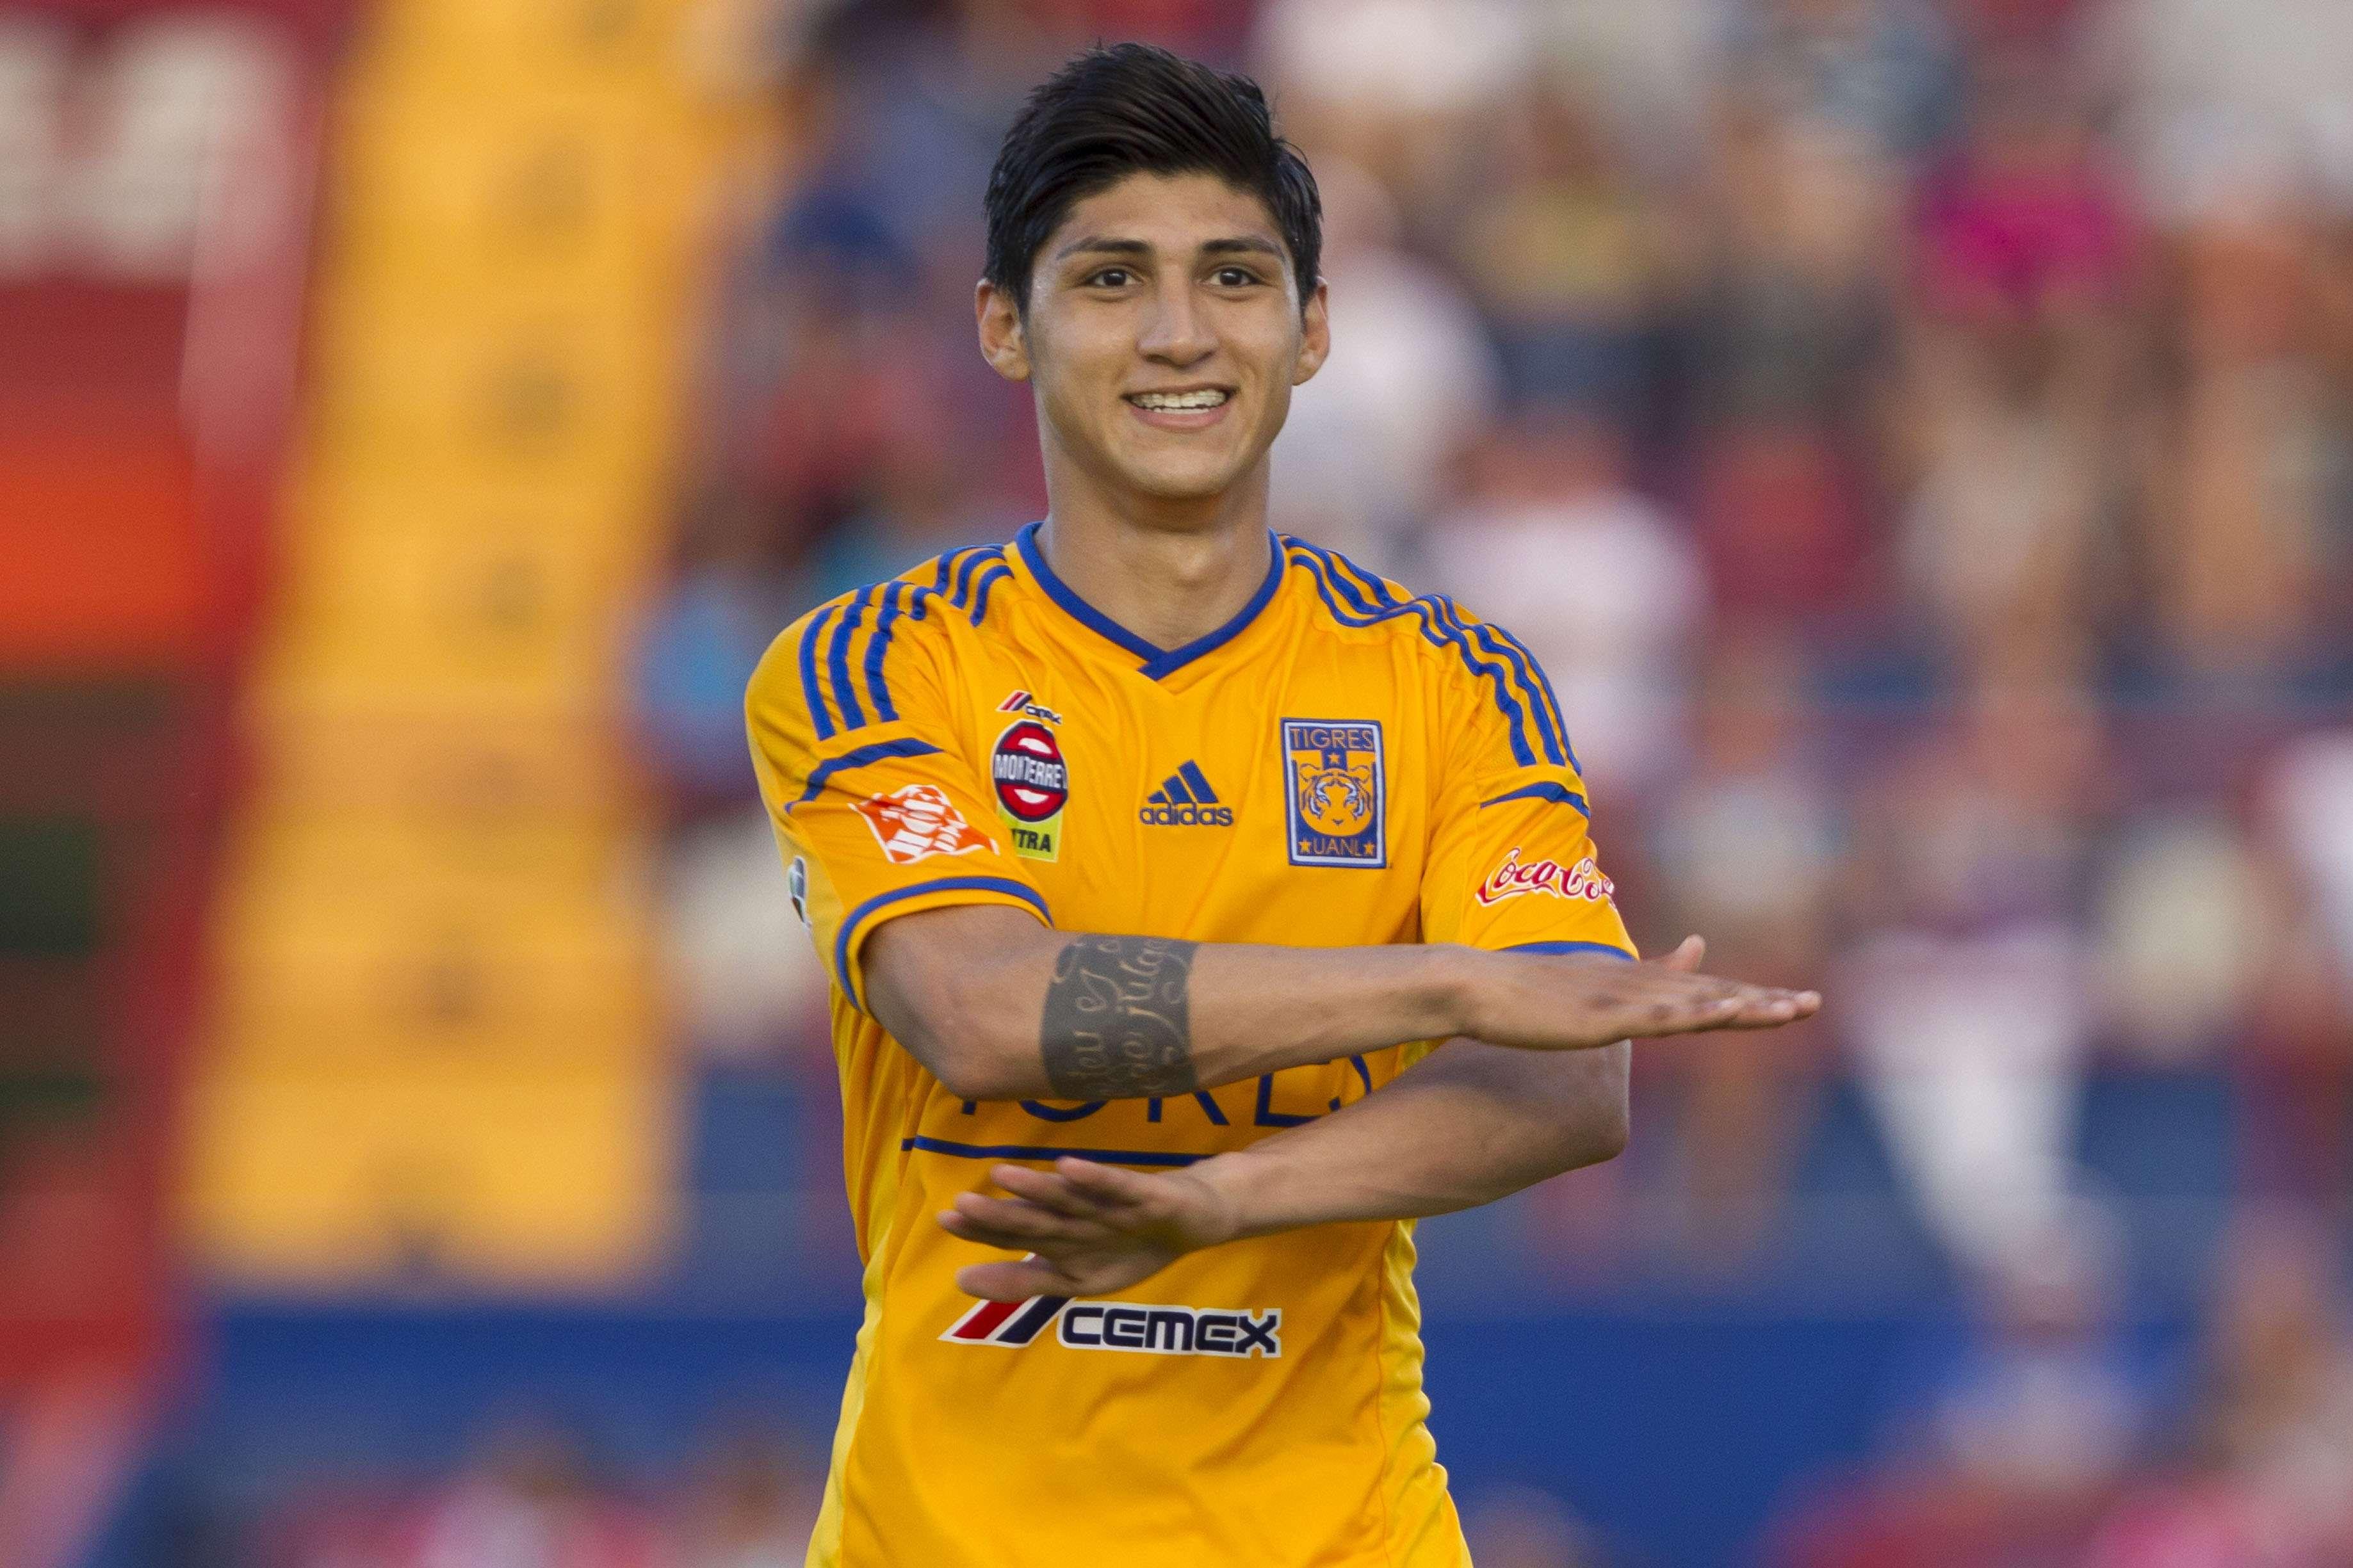 Pulido vuelve a sonreír. Foto: Mexsport